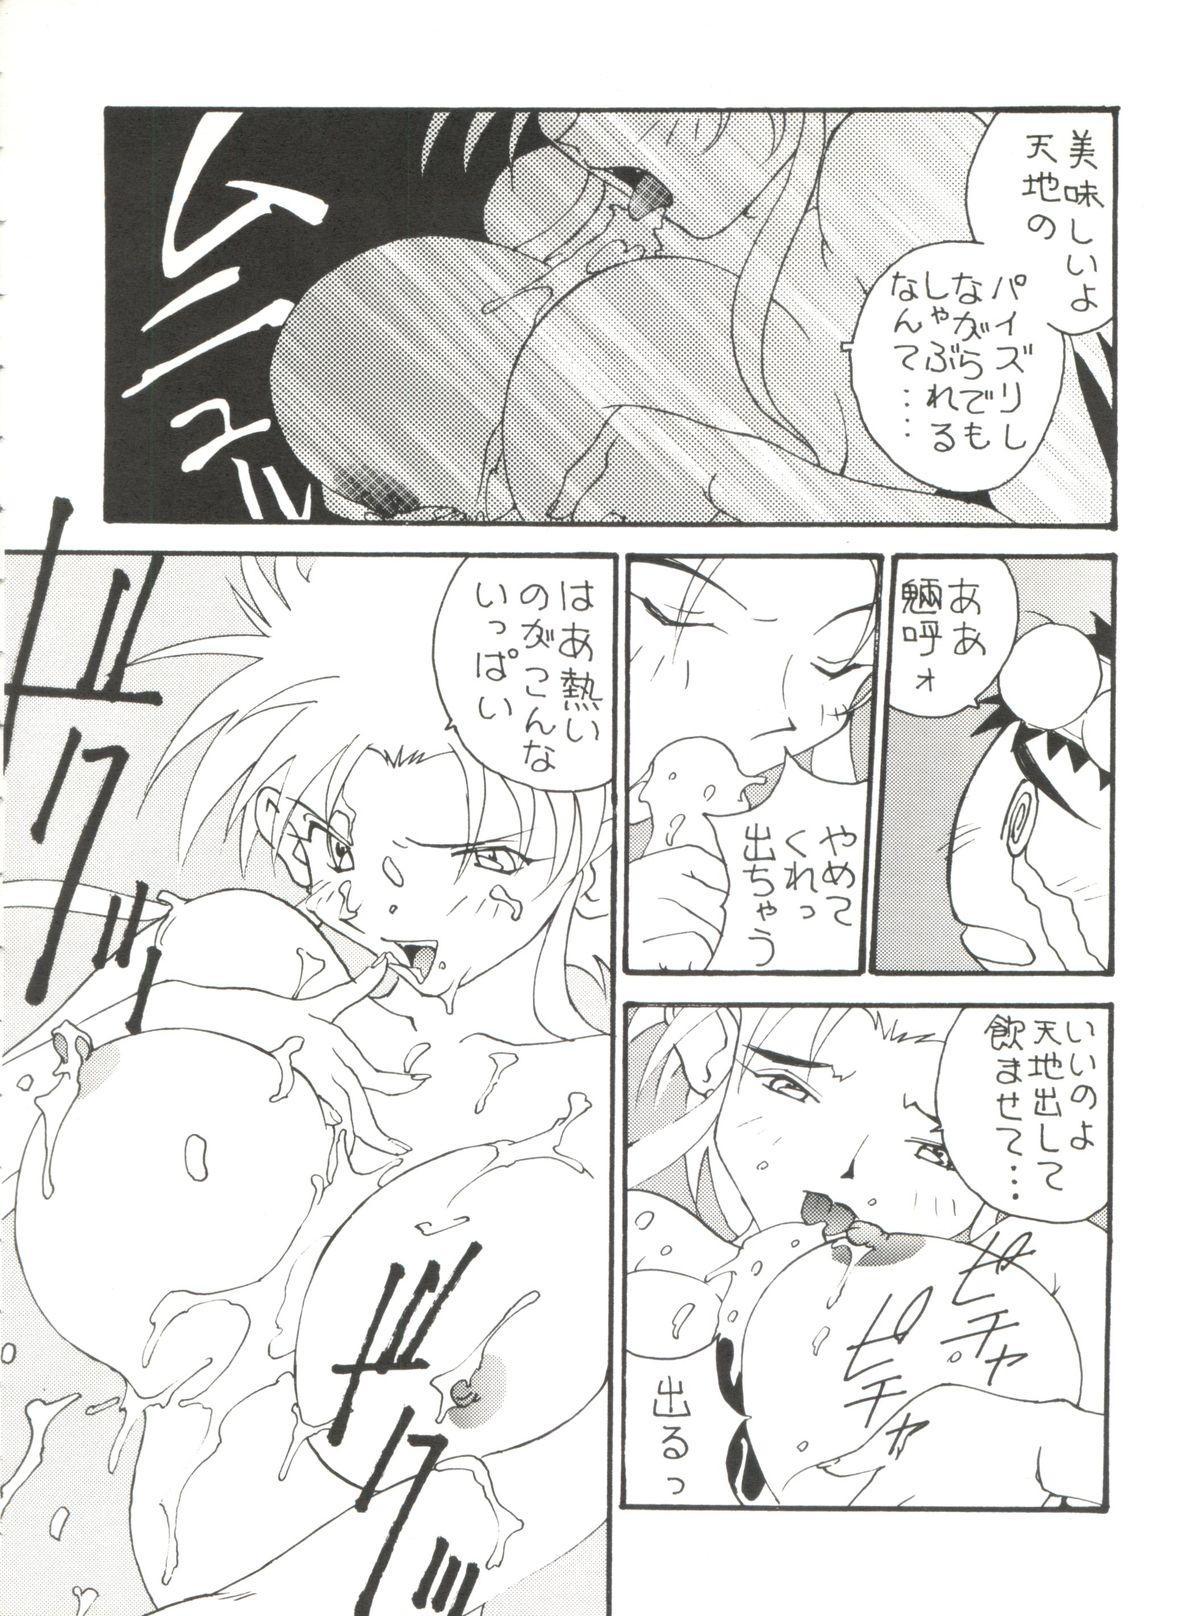 Toufuya Kyuuchou 12